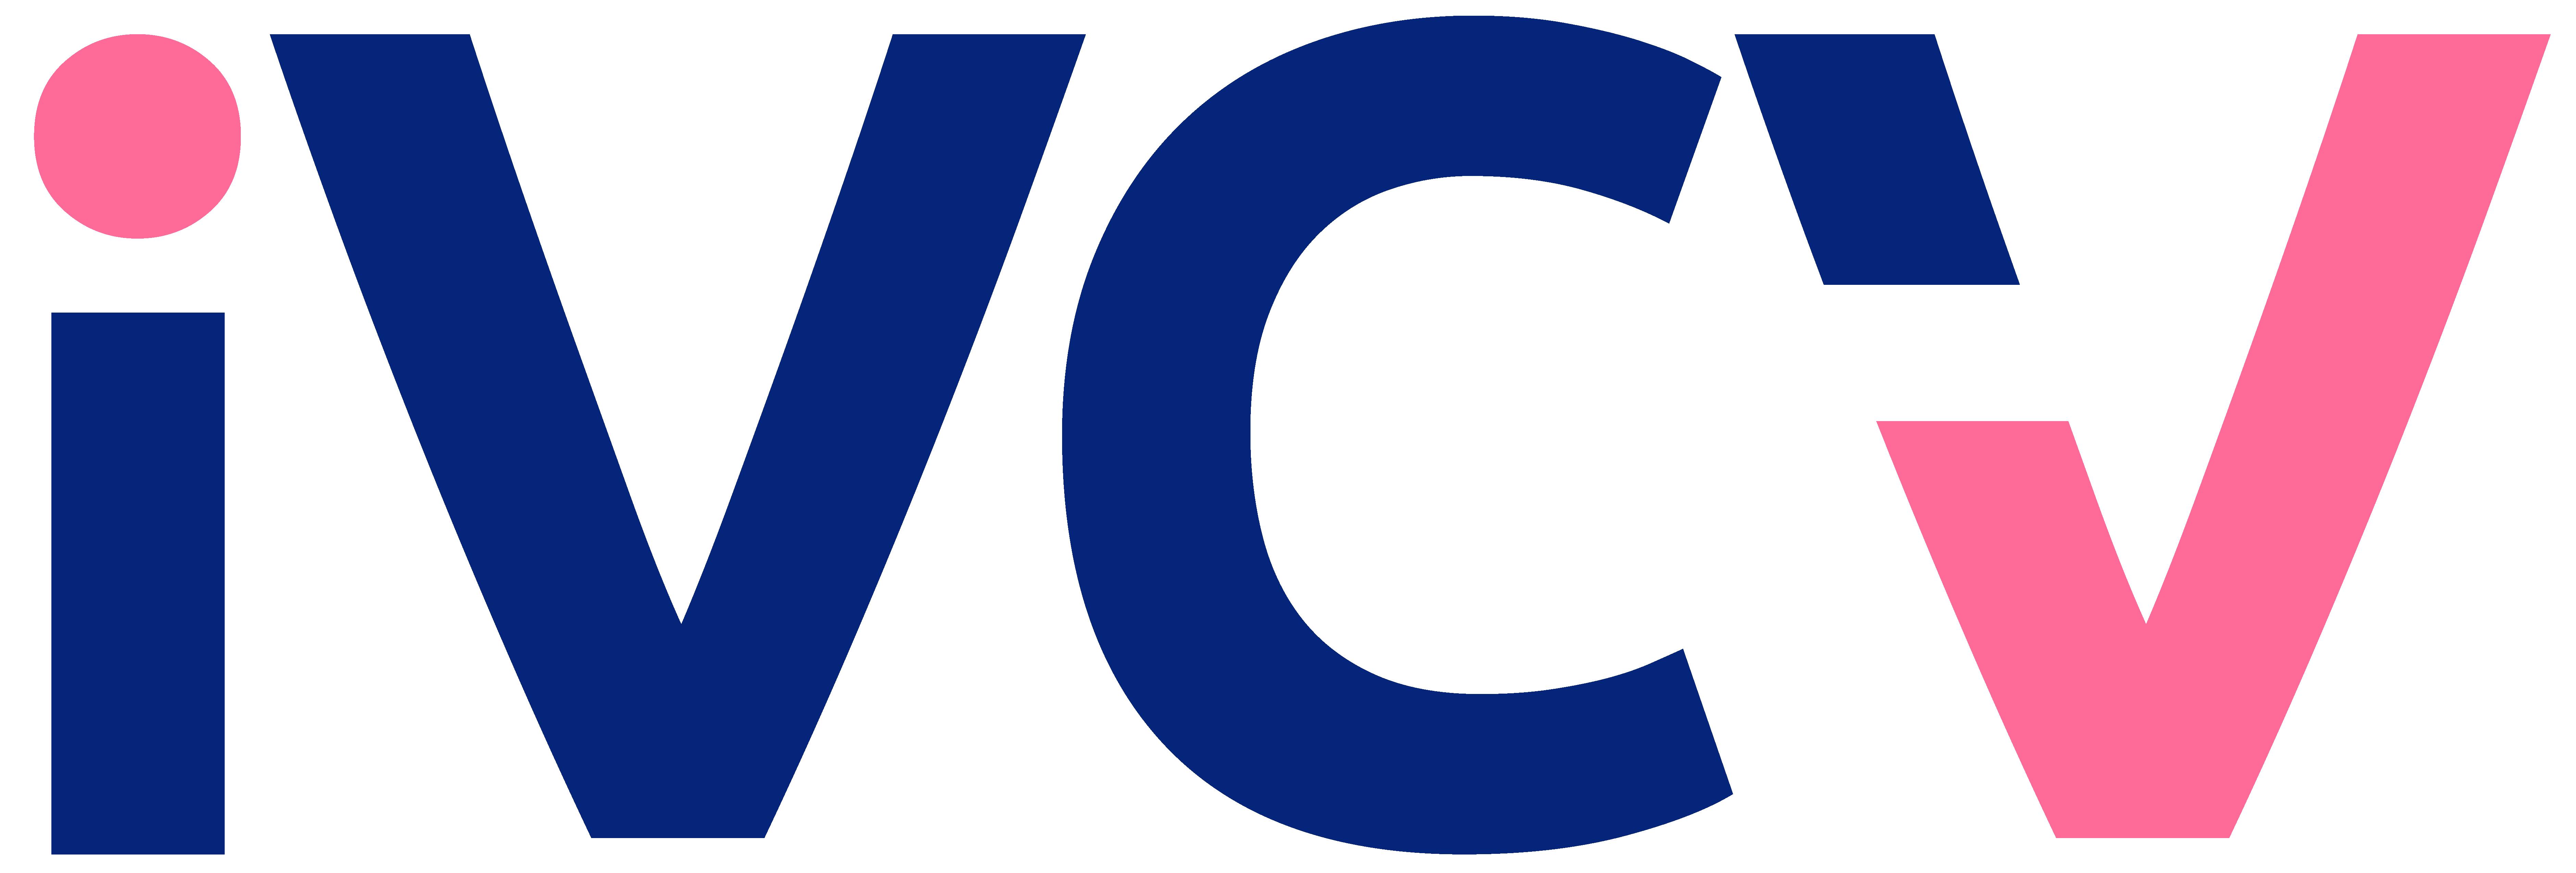 iVCV logo